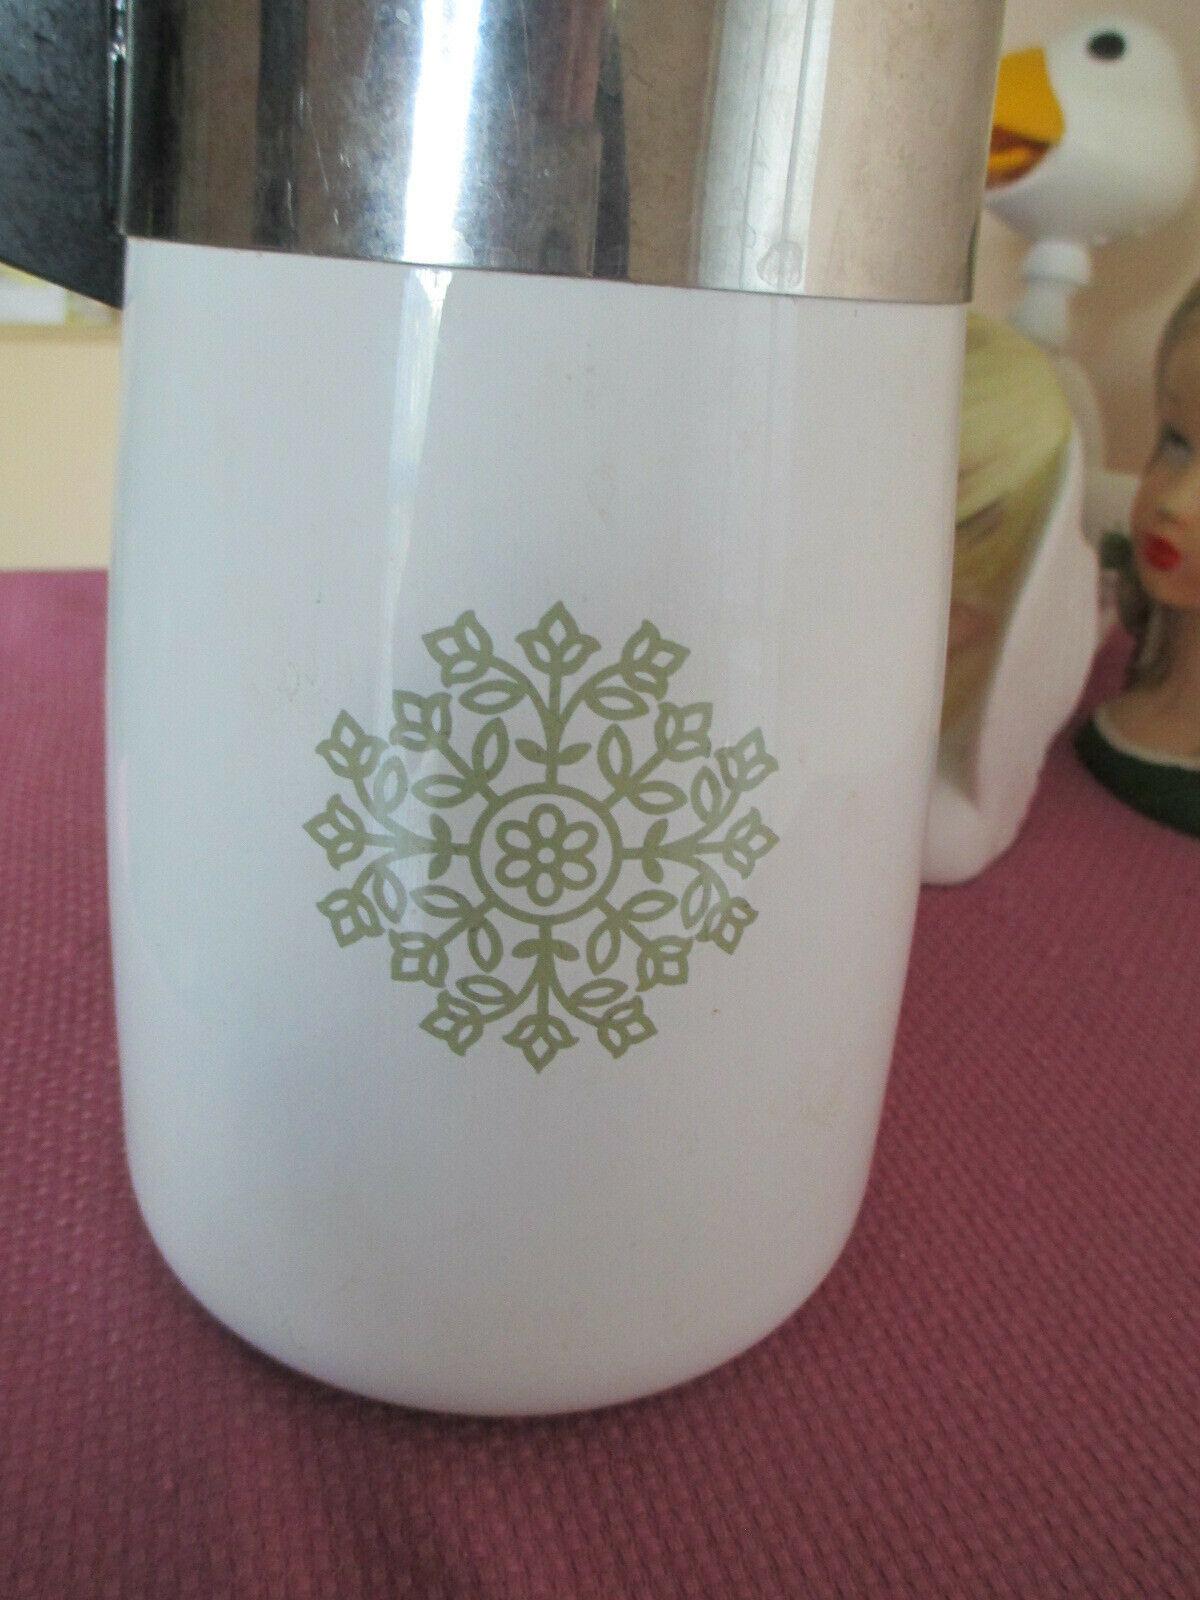 CORNING WARE 6 CUP PERCOLATOR COFFEE POT, AVOCADO MEDALLION